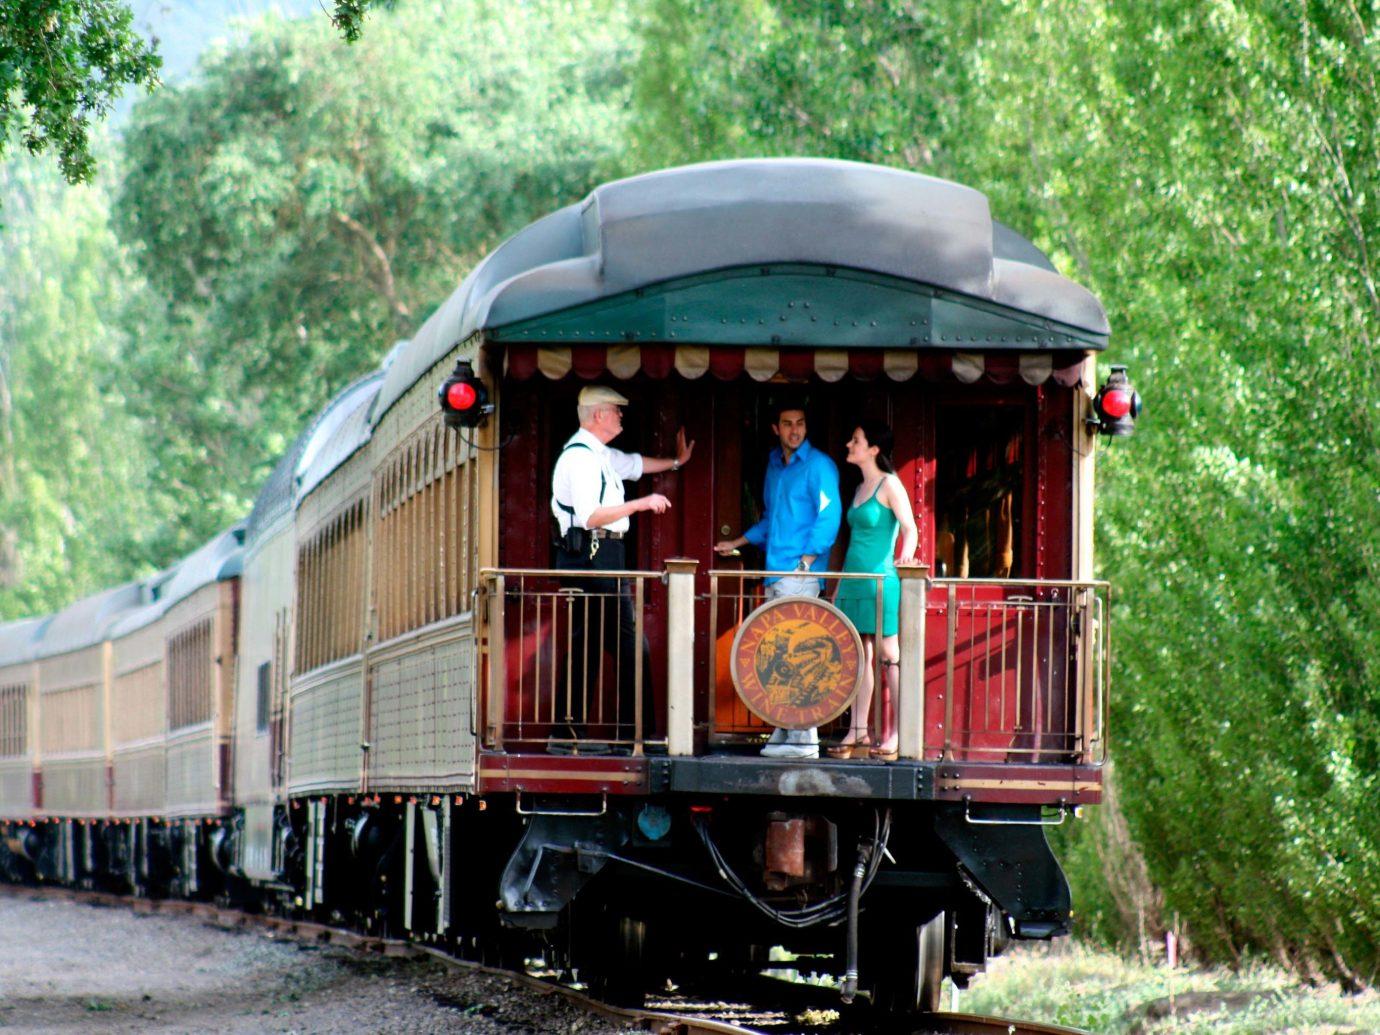 Romance Trip Ideas tree outdoor vehicle track land vehicle transport train rolling stock locomotive rail transport railroad car passenger car traveling railroad